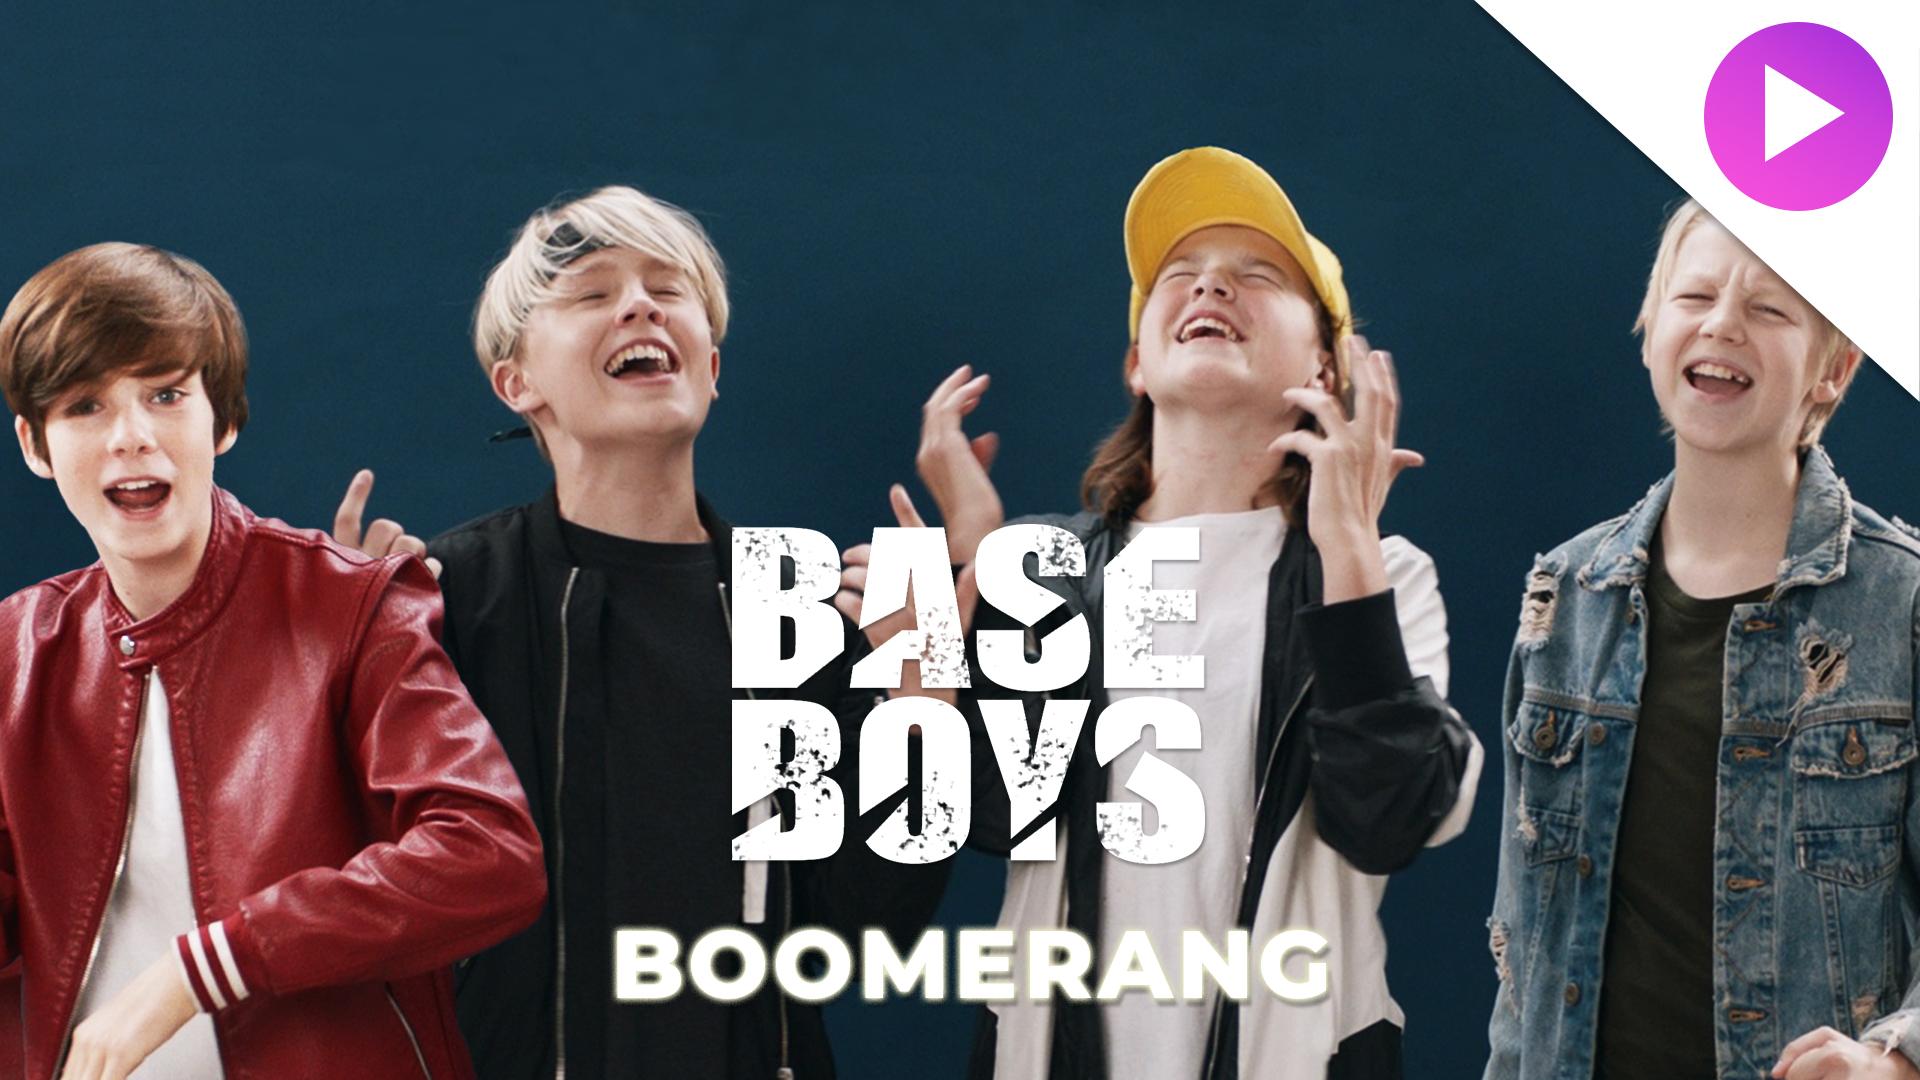 bb_boomerang_musikvideo_04_drupal.jpg